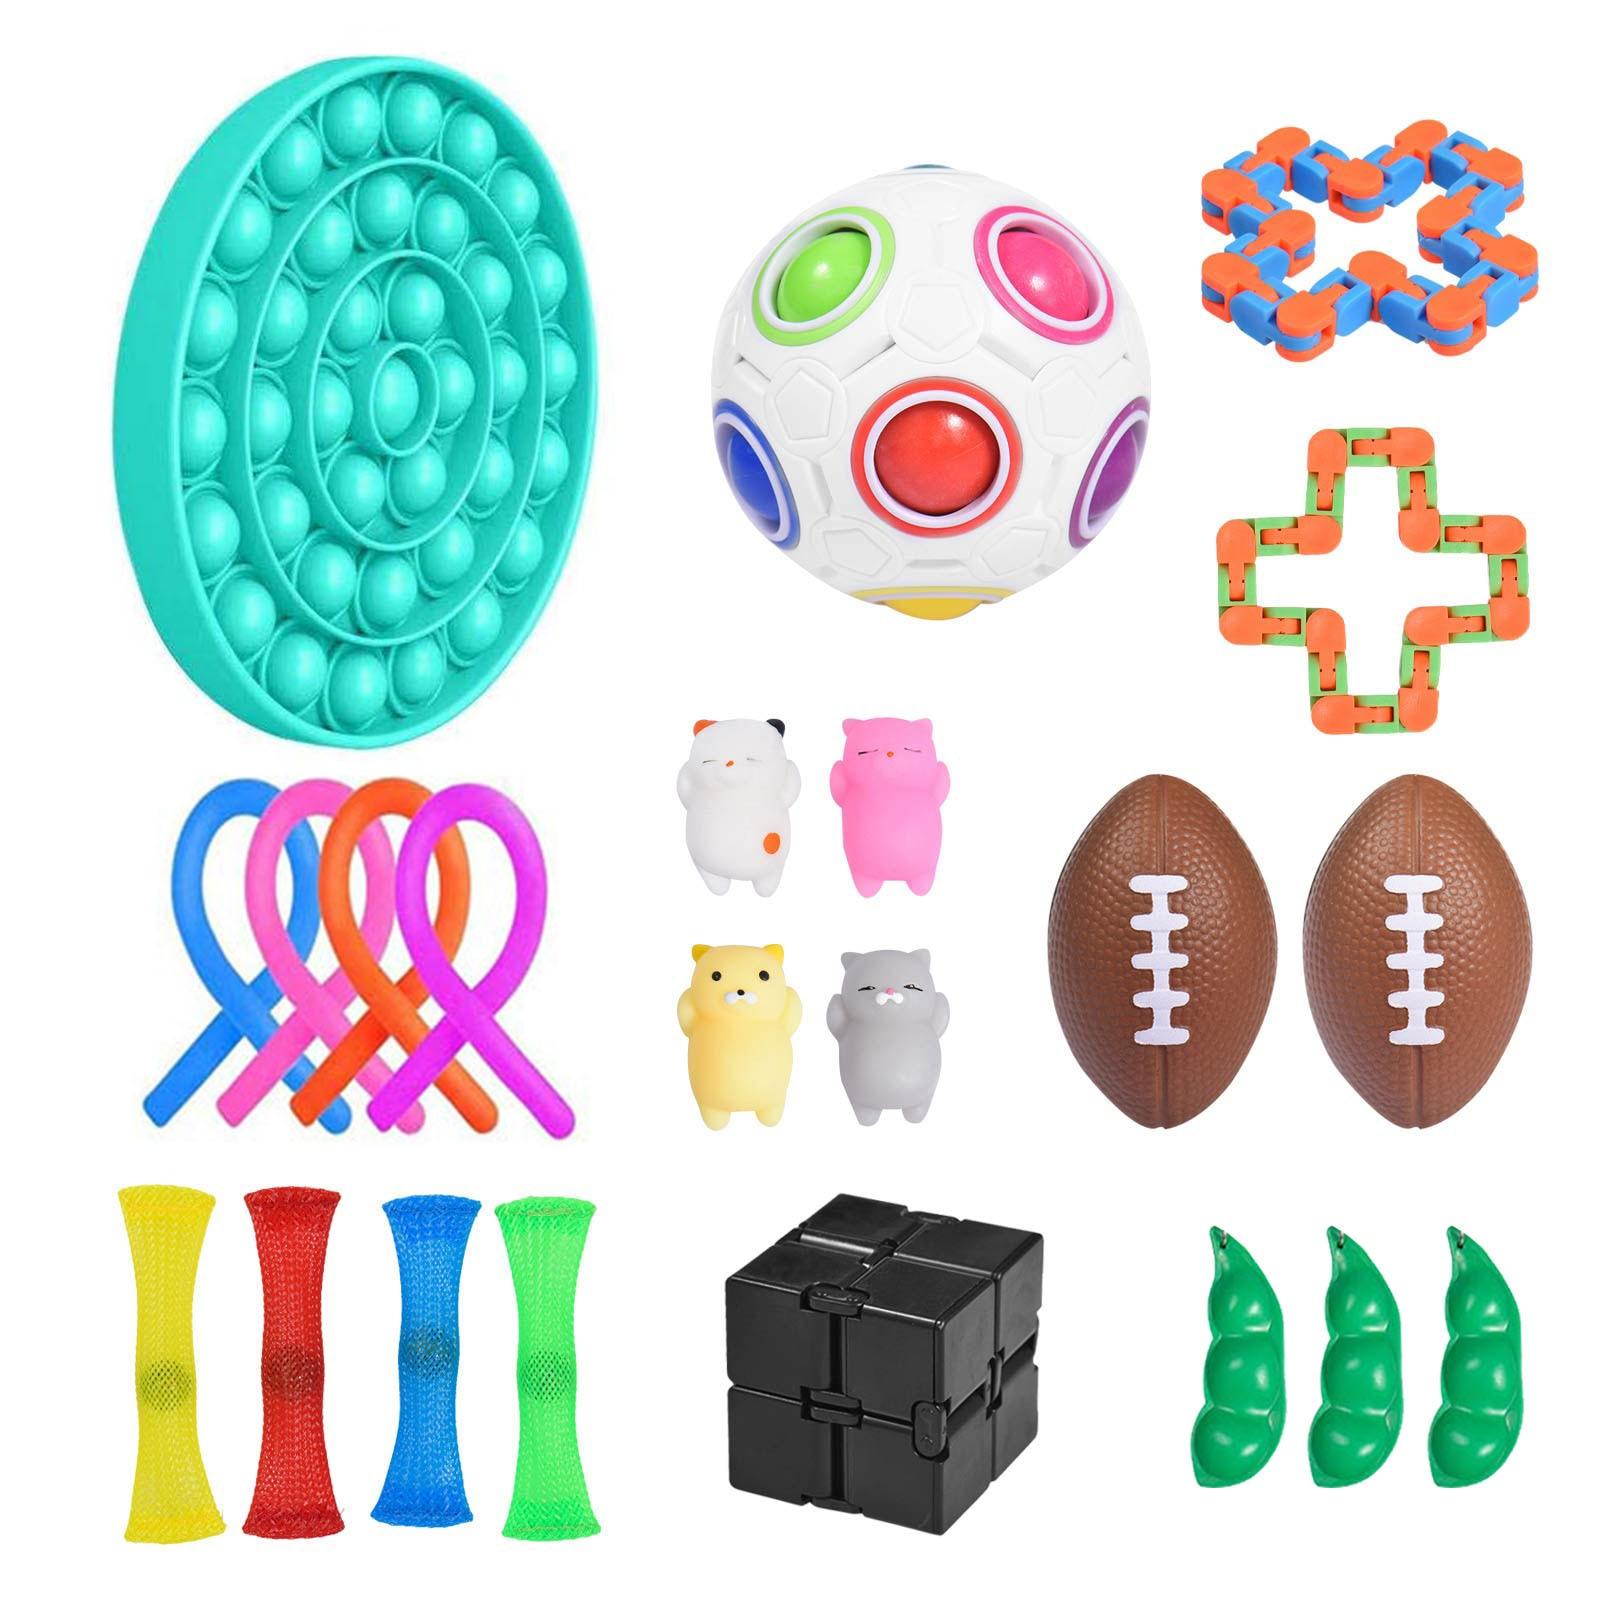 22 Pcs Fidget Pluck Sensory Toy Stick Wall Marble Ball Wall Set Stress Relief Pop Bubble Fidget Toys Kids Adults Antistress Toy enlarge